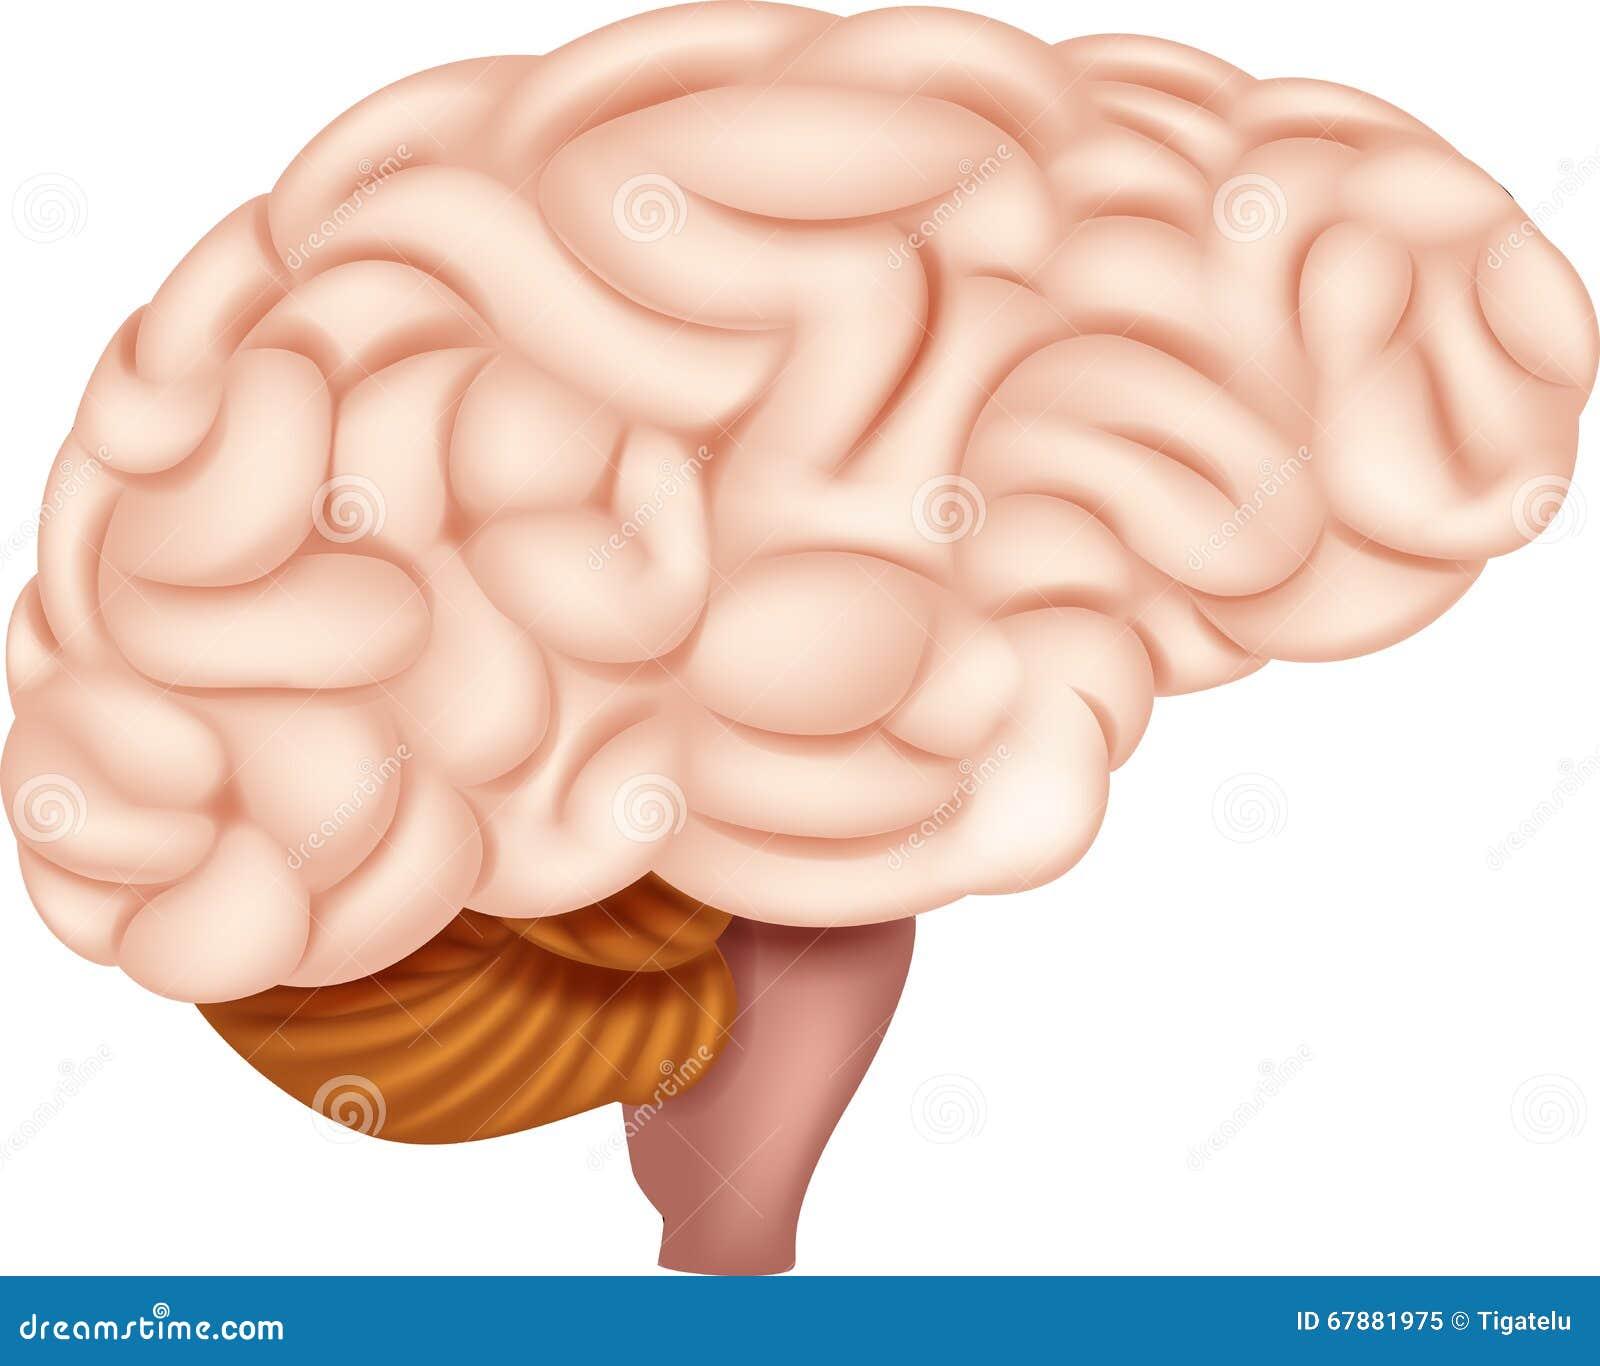 Human Brain Anatomy